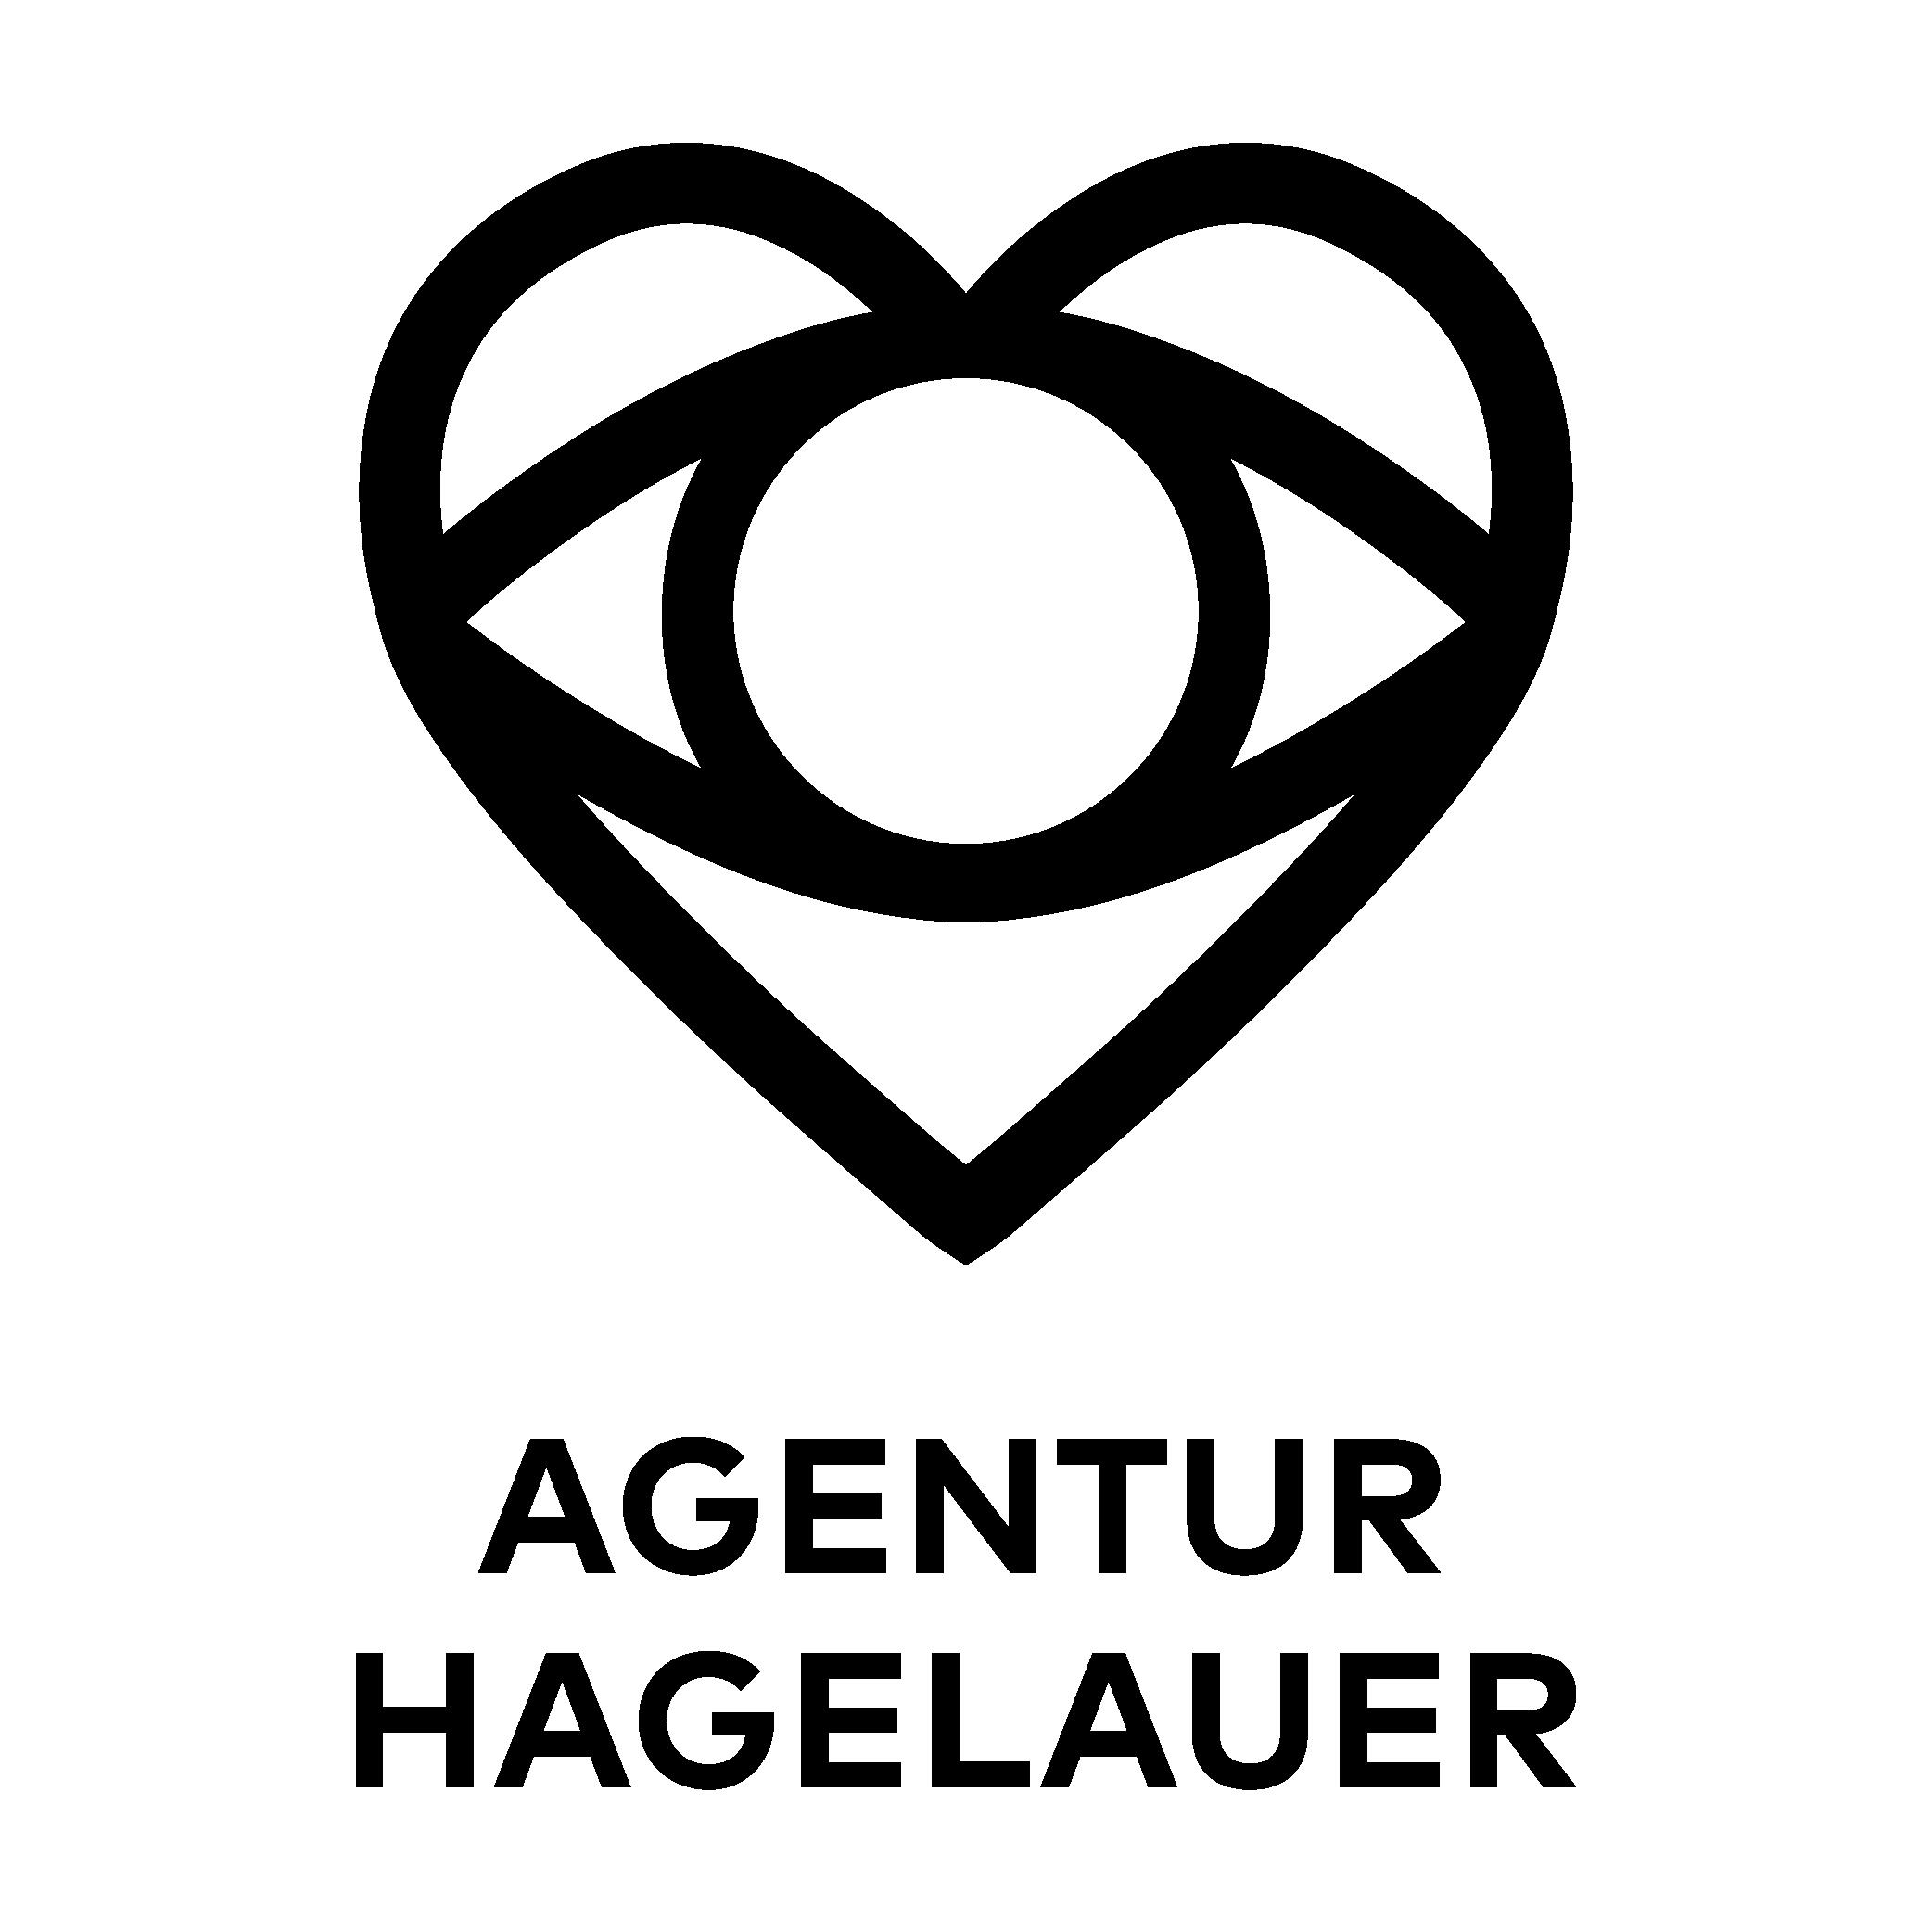 Agentur Hagelauer